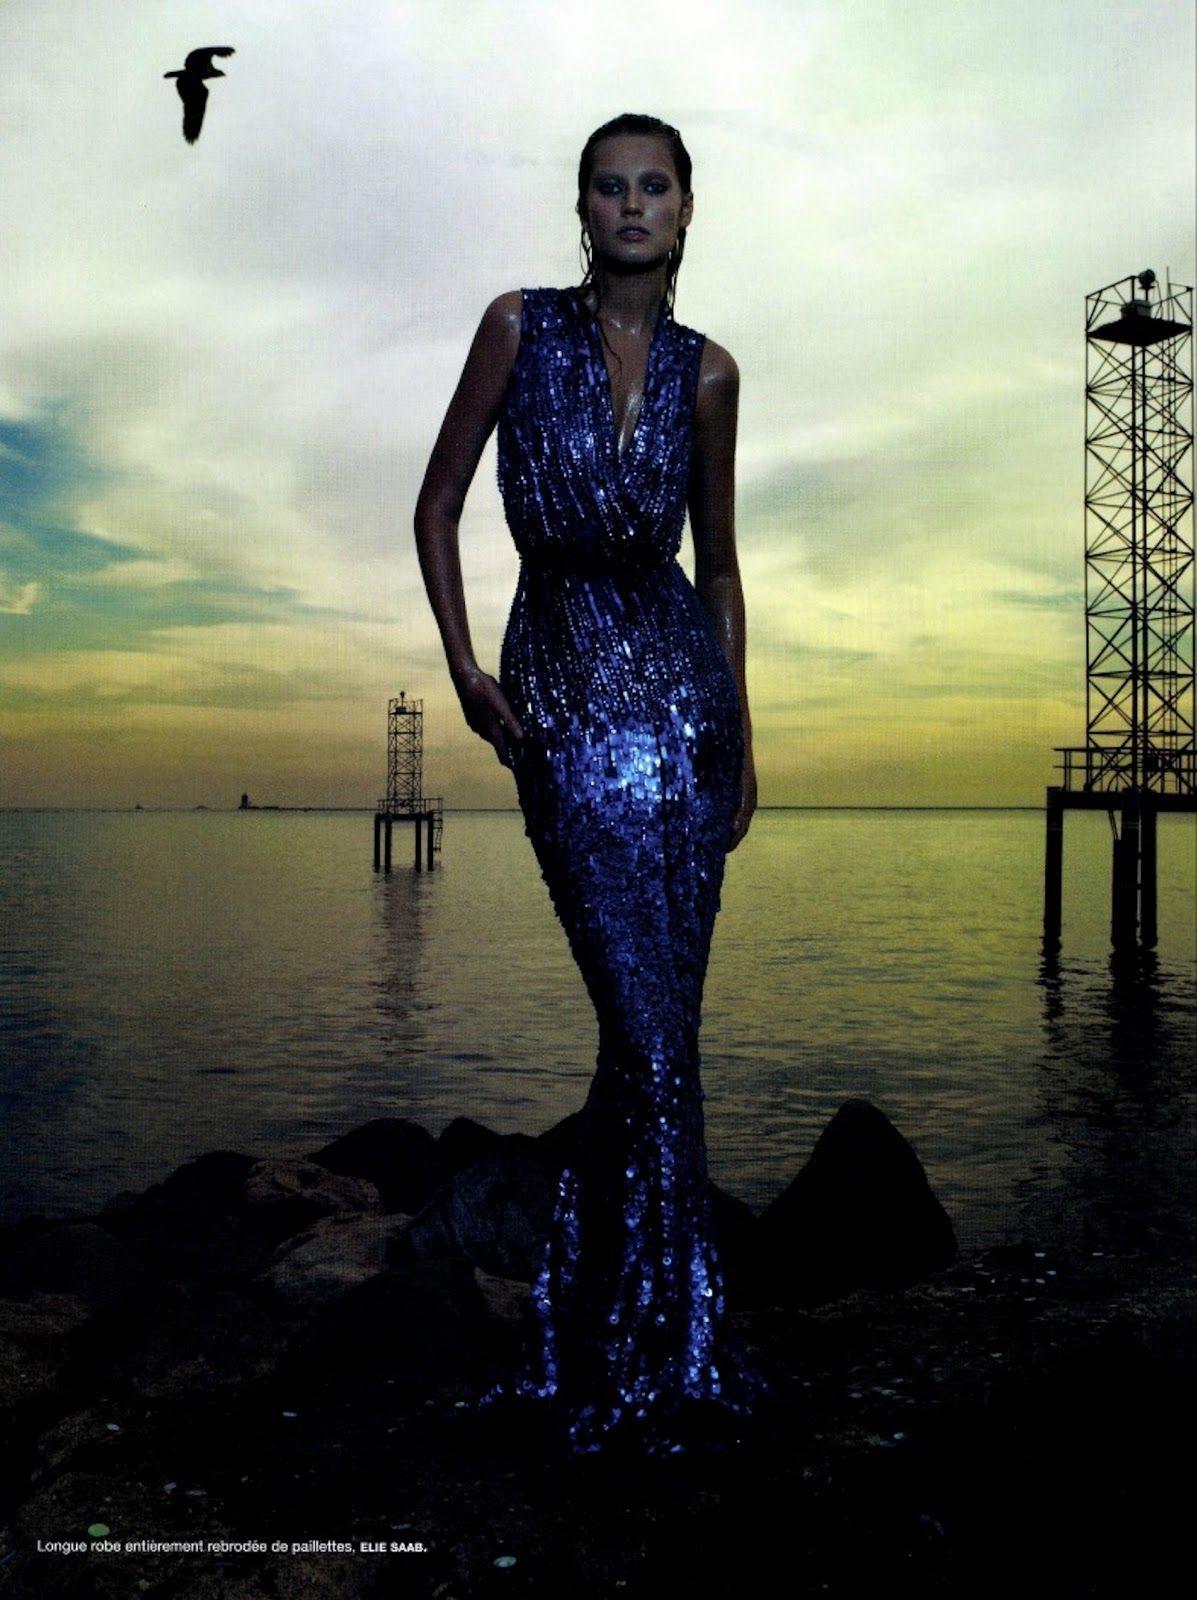 splash: toni garrn by camilla akrans for numéro #130 february 2012 | visual optimism; fashion editorials, shows, campaigns & more!